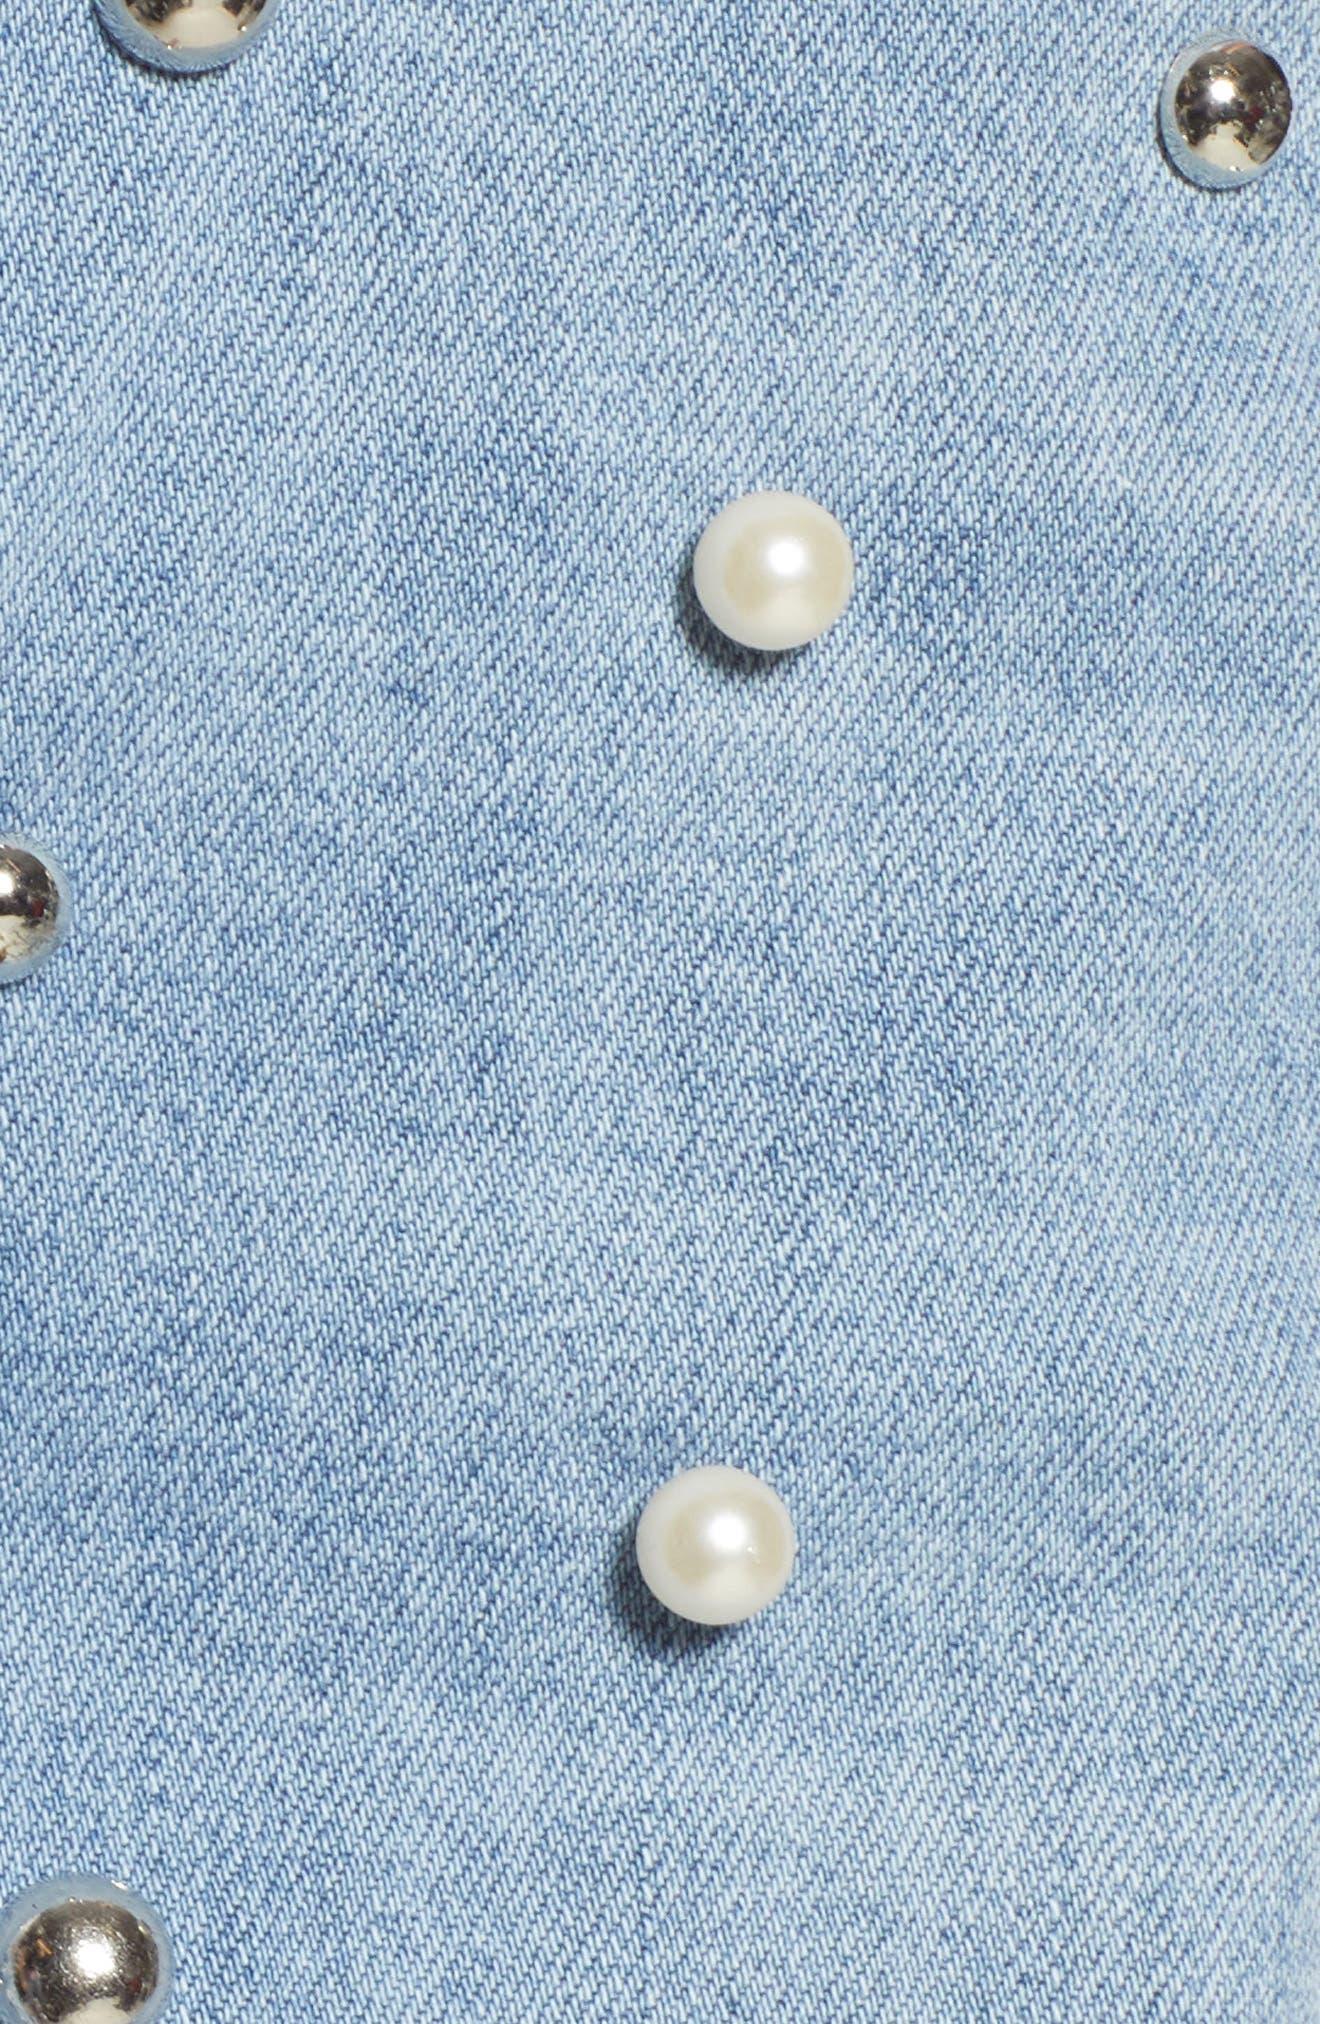 Imitation Pearl & Stud Ripped Denim Bermuda Shorts,                             Alternate thumbnail 6, color,                             400